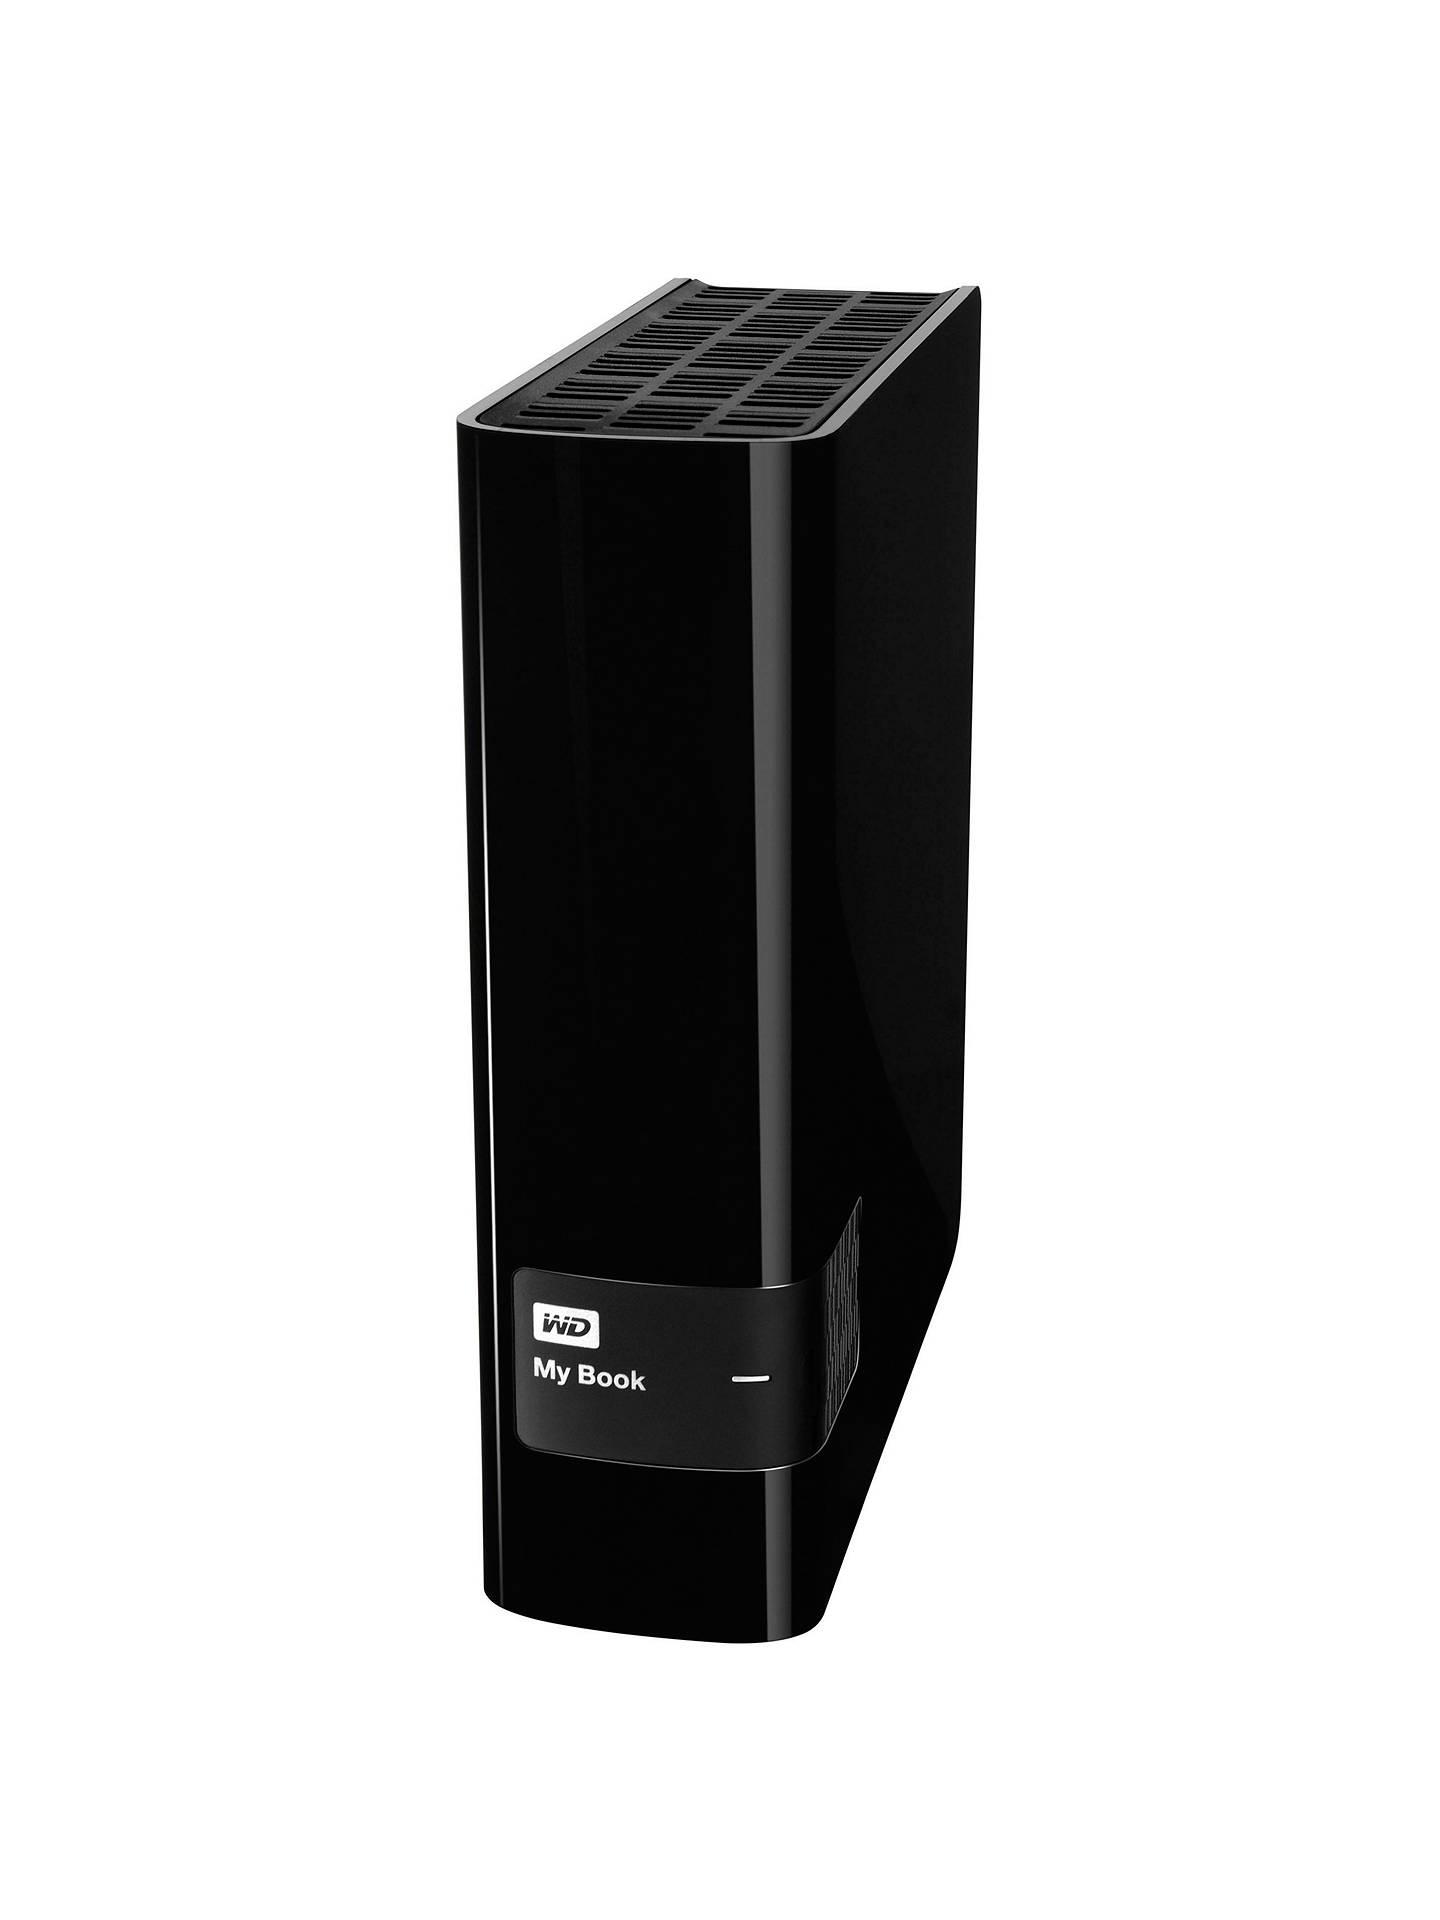 WD My Book External Hard Drive, USB 3 0, 3TB for Mac at John